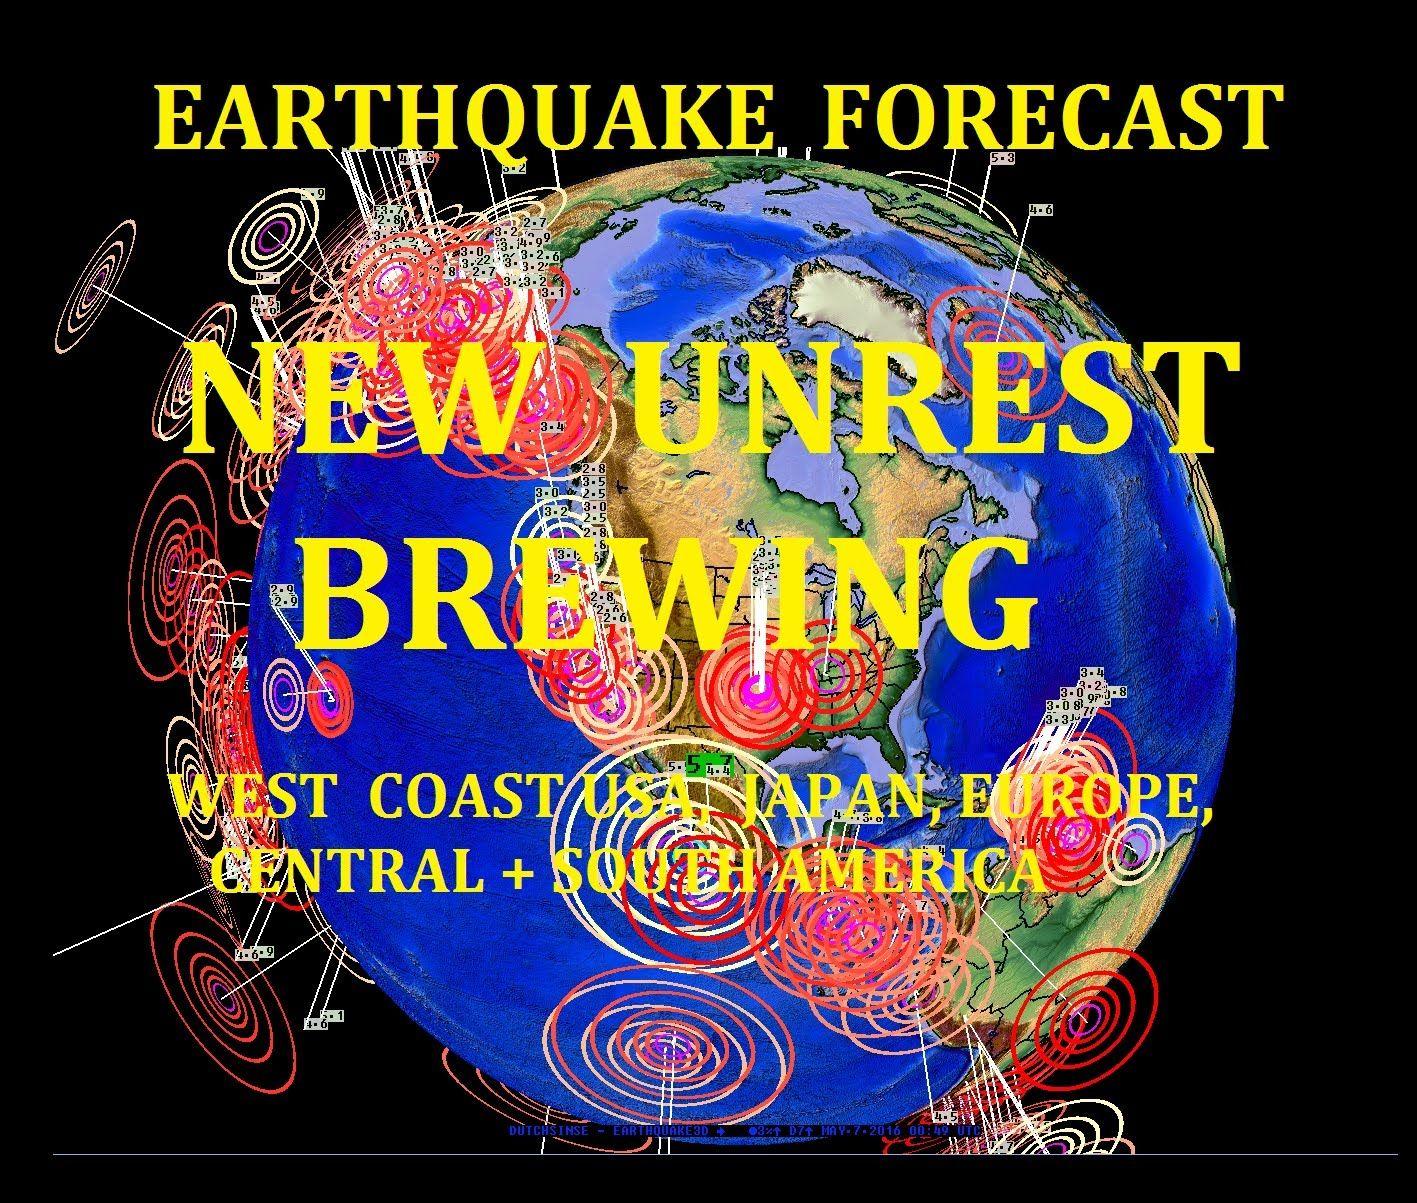 5/06/2016 -- Earthquake Forecast -- West Coast under pressure + International Unrest brewing   Earthquake. Spirit of fear. Under pressure